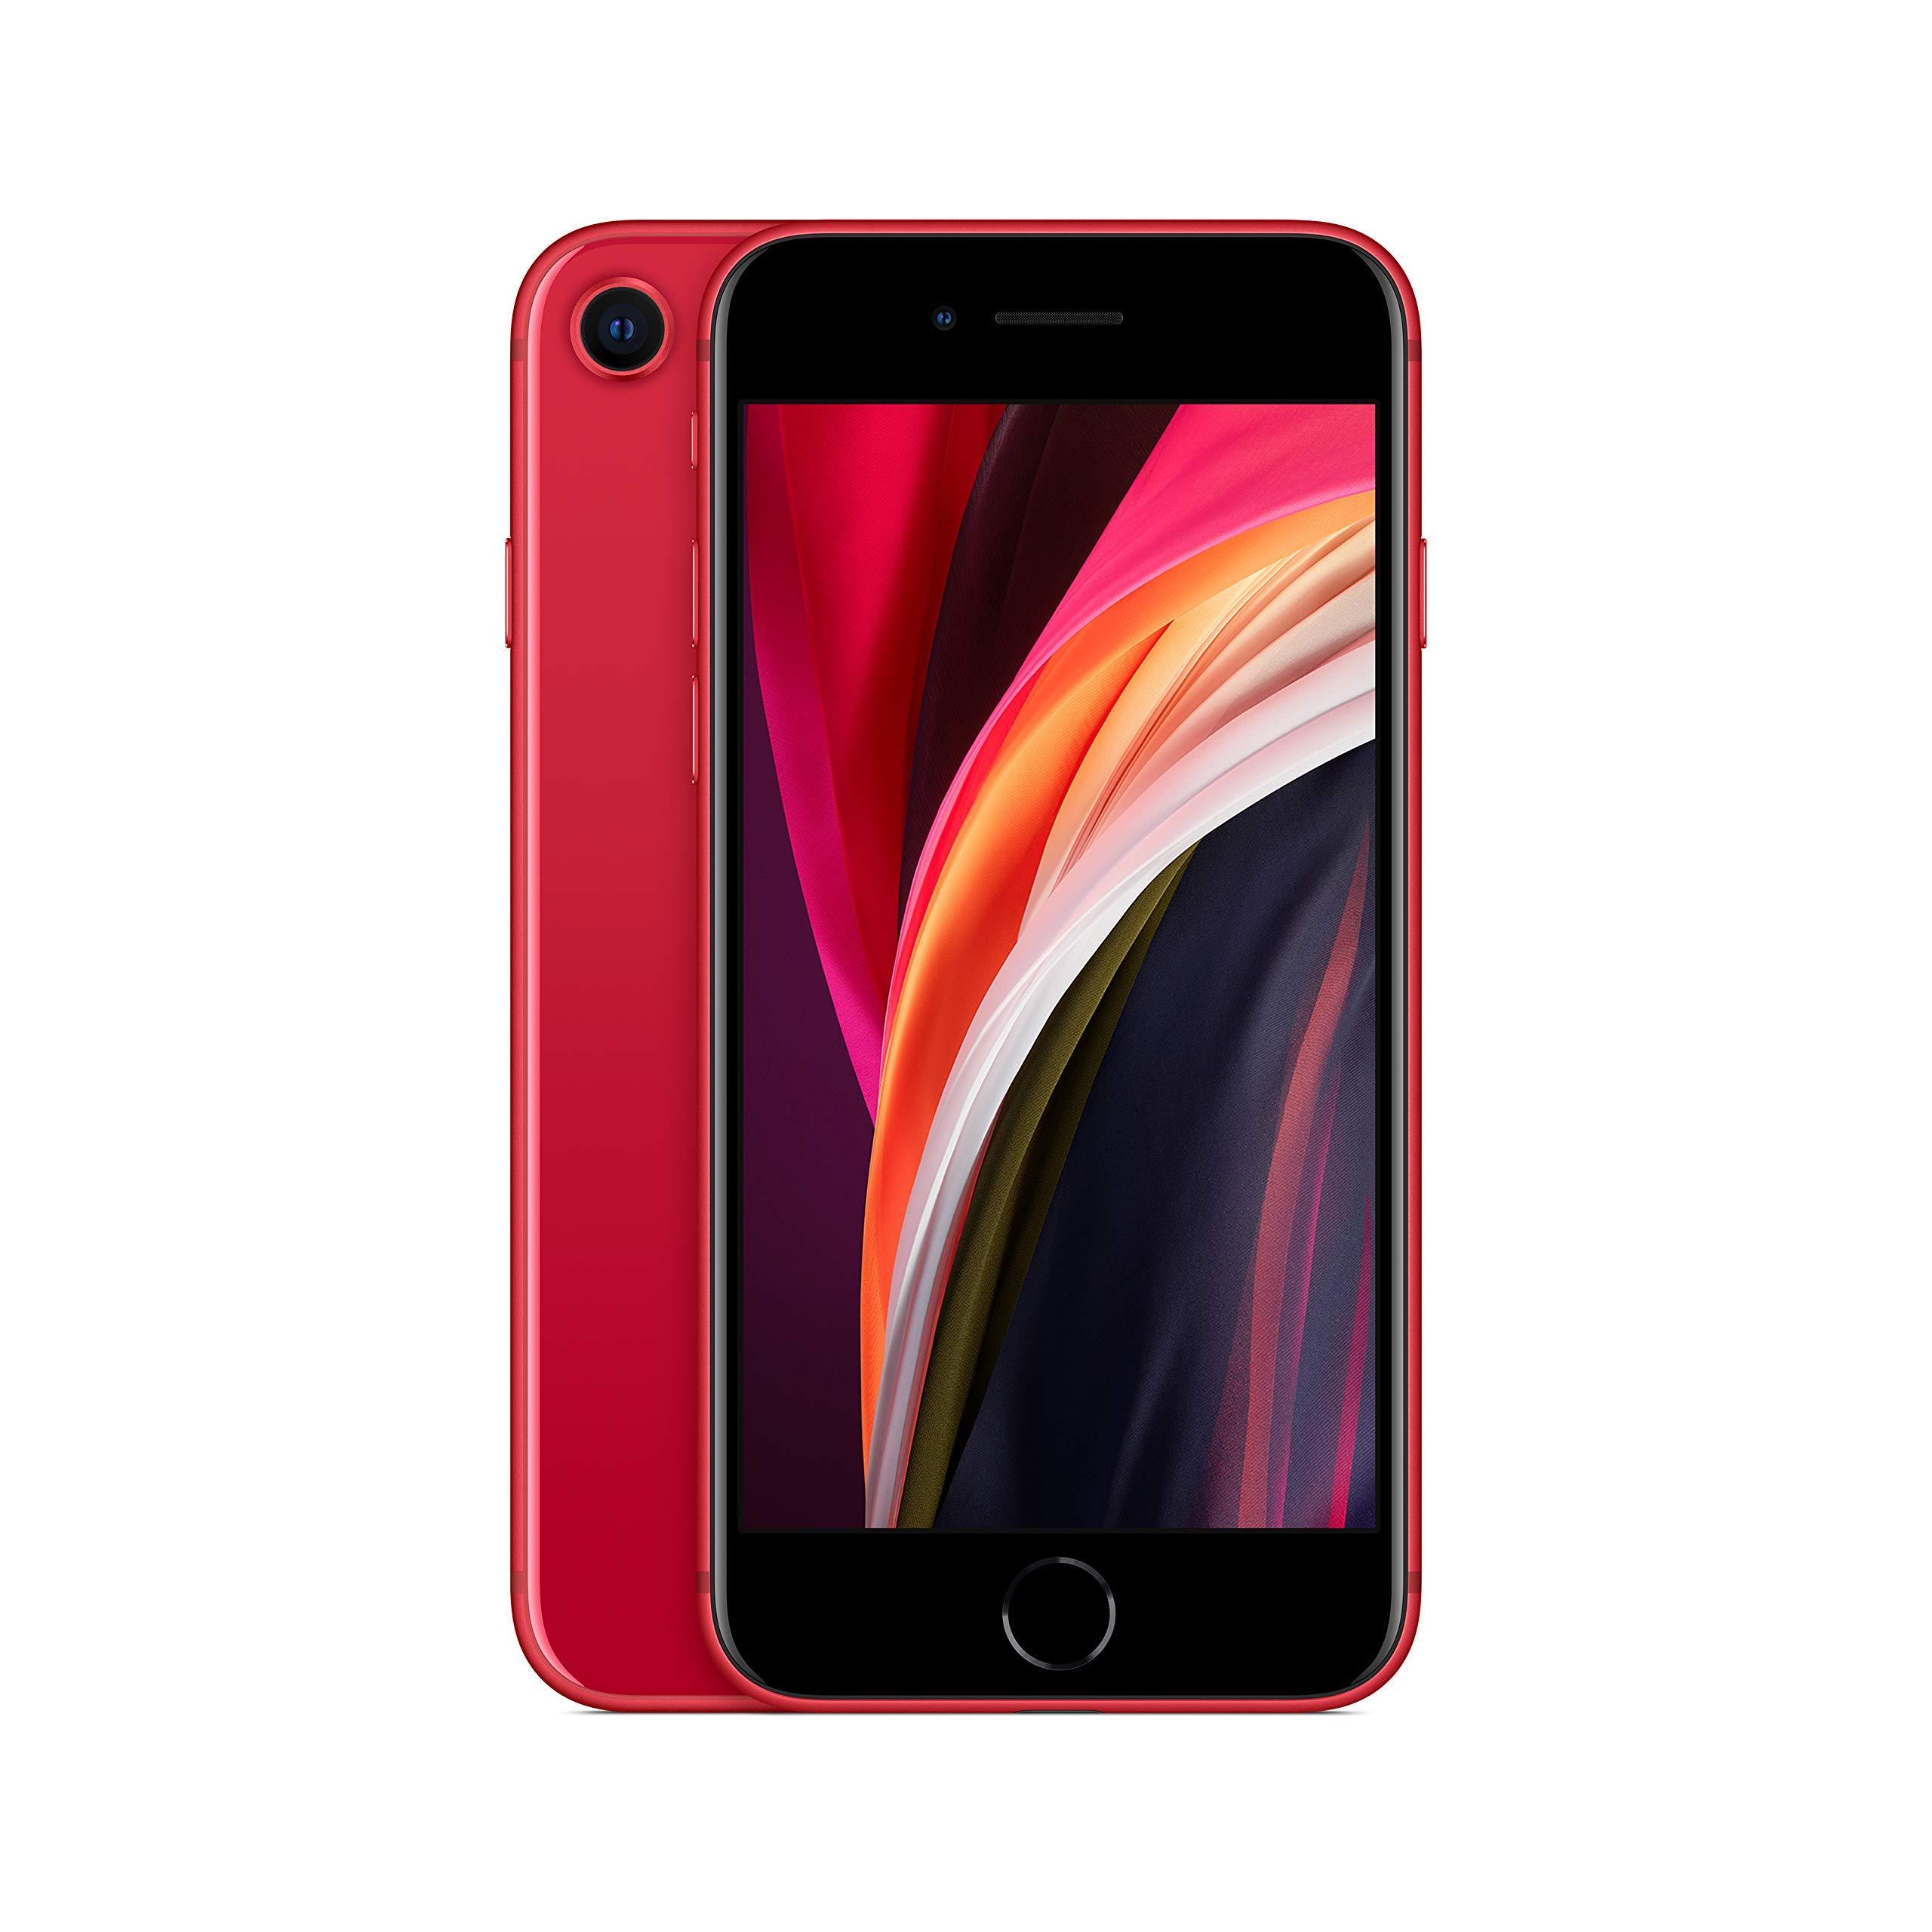 Apple iPhone SE, 64GB, Red - for Verizon (Renewed)